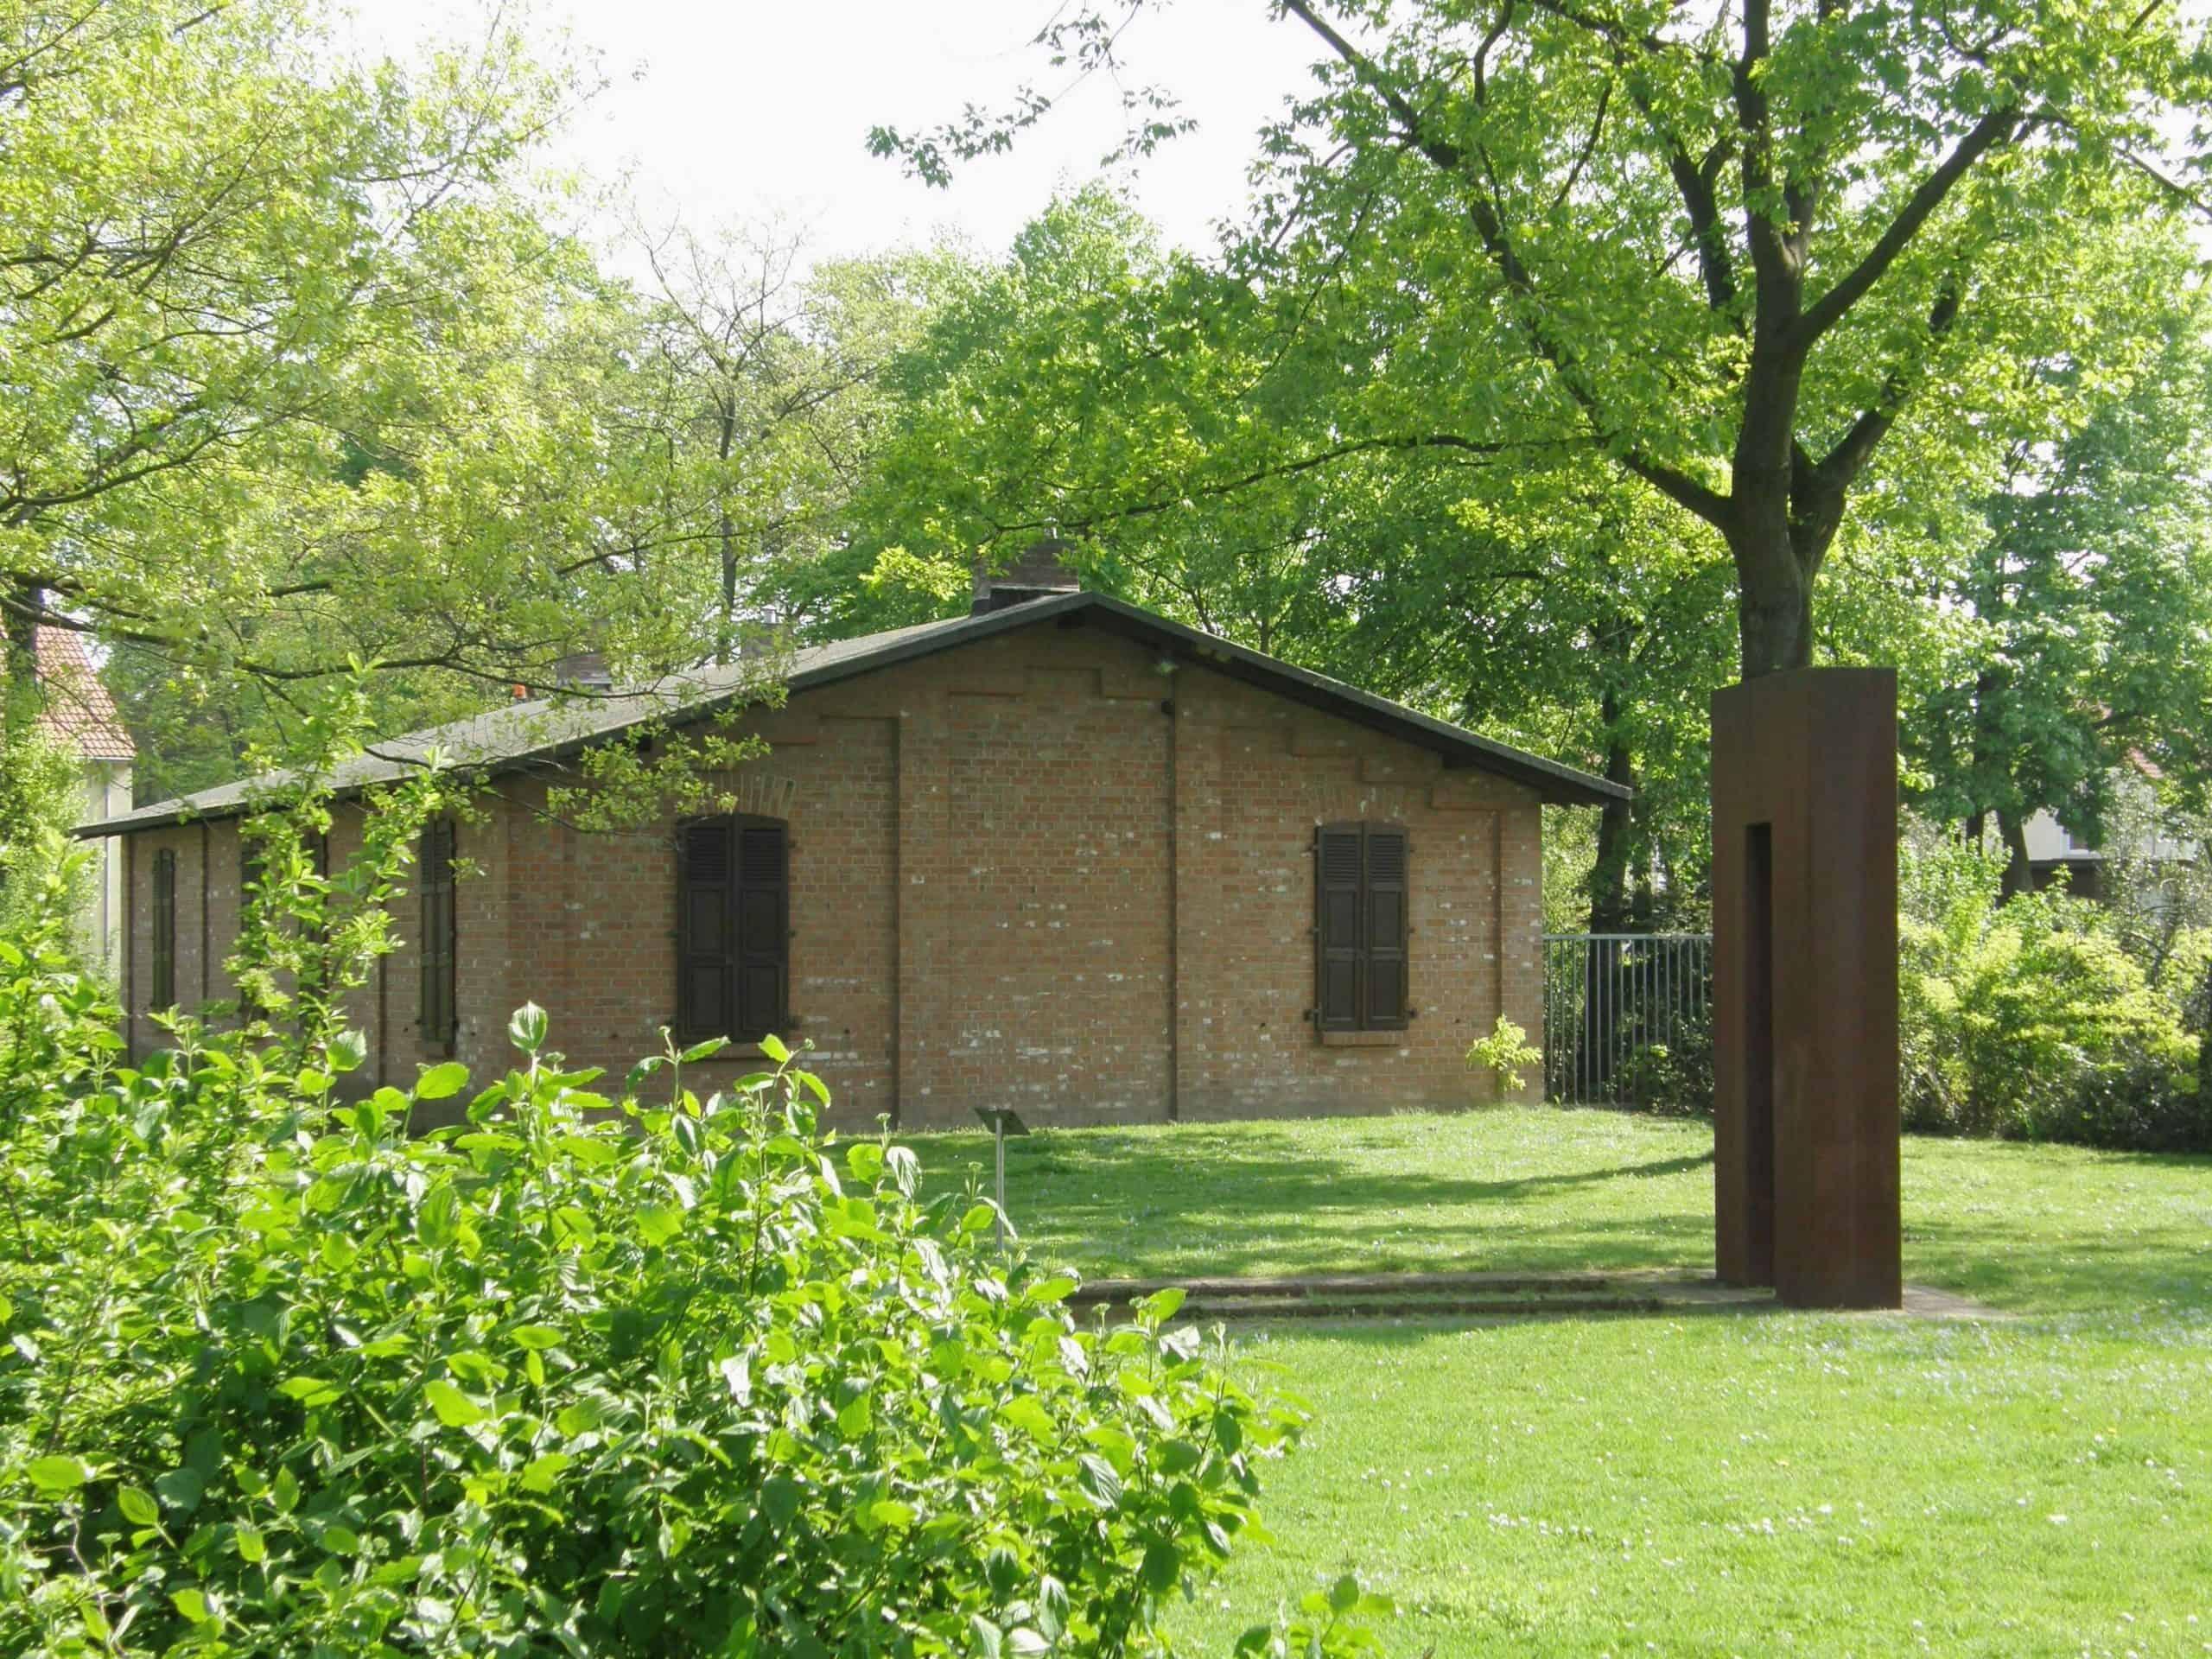 Das Bild zeigt das Bürgerhaus Friedrichsfeld